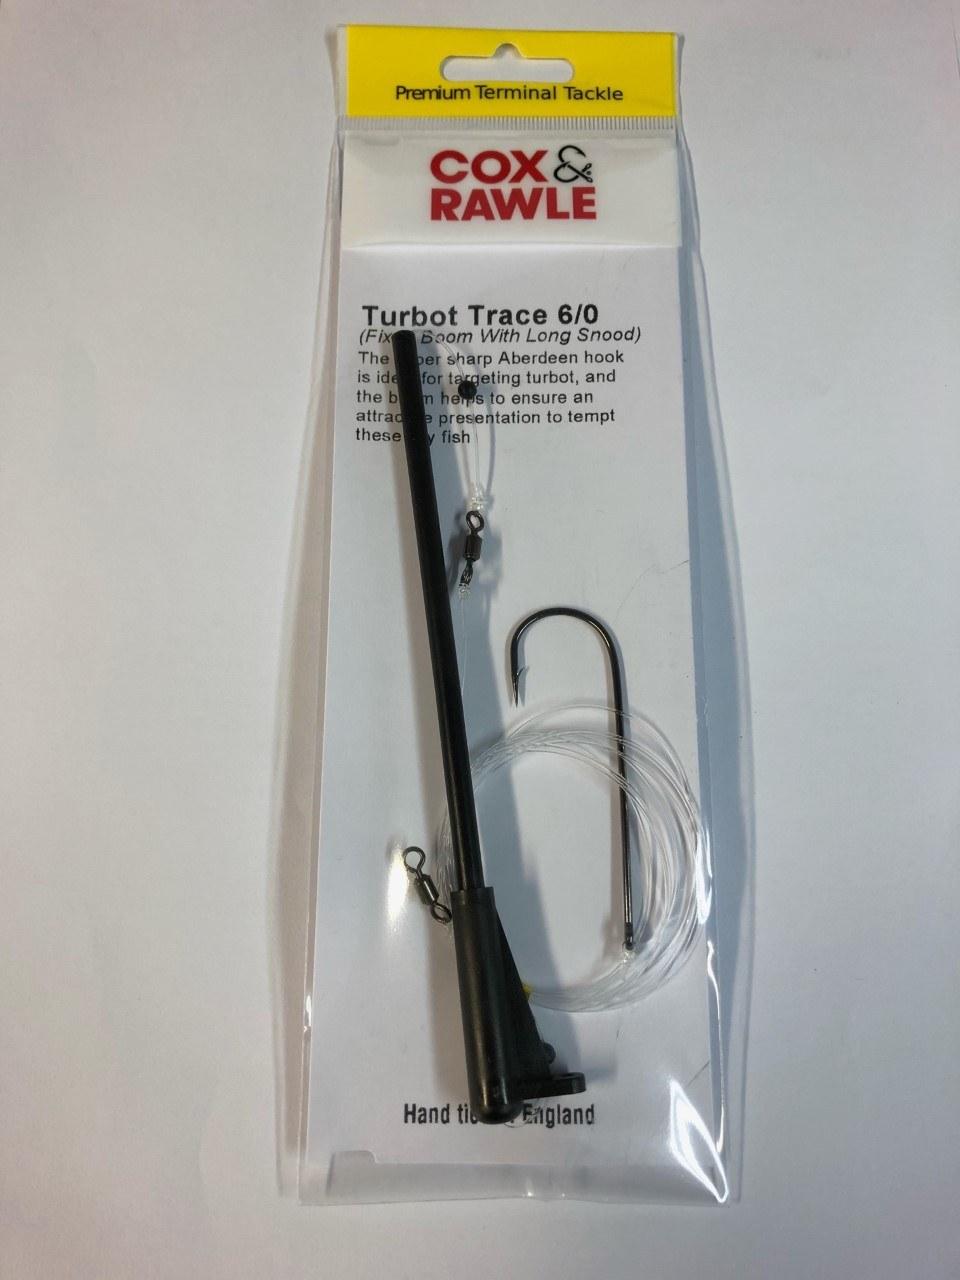 Cox & Rawle Turbot Trace